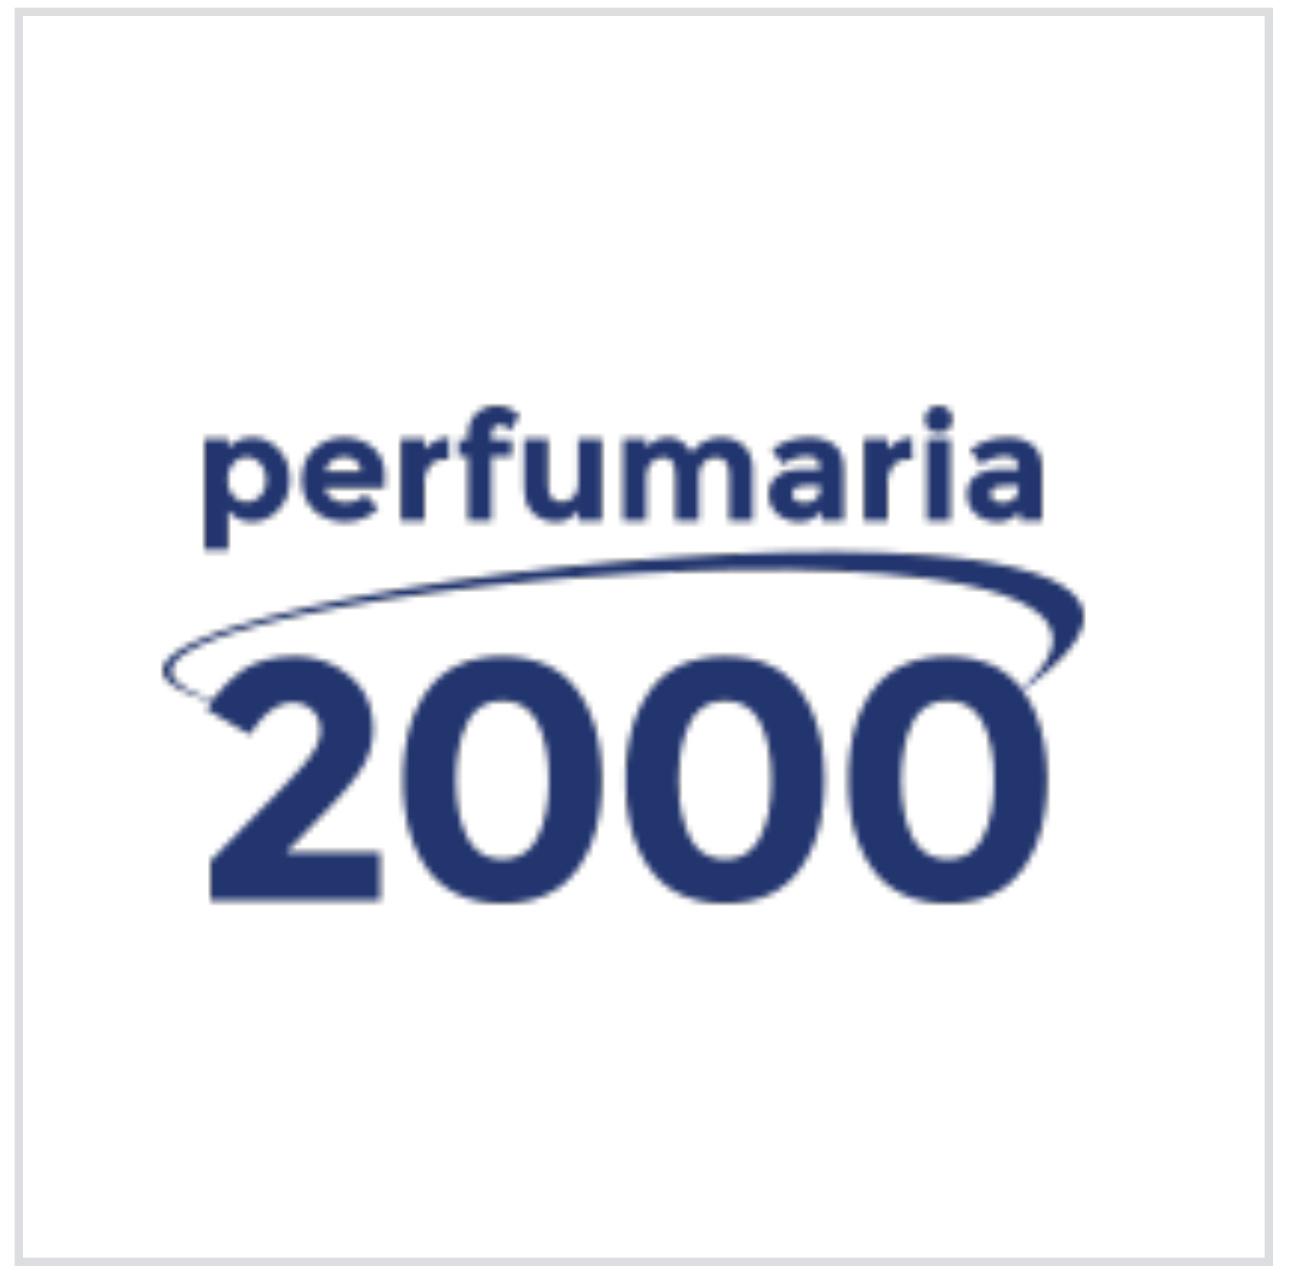 logo_perfumaria_2000